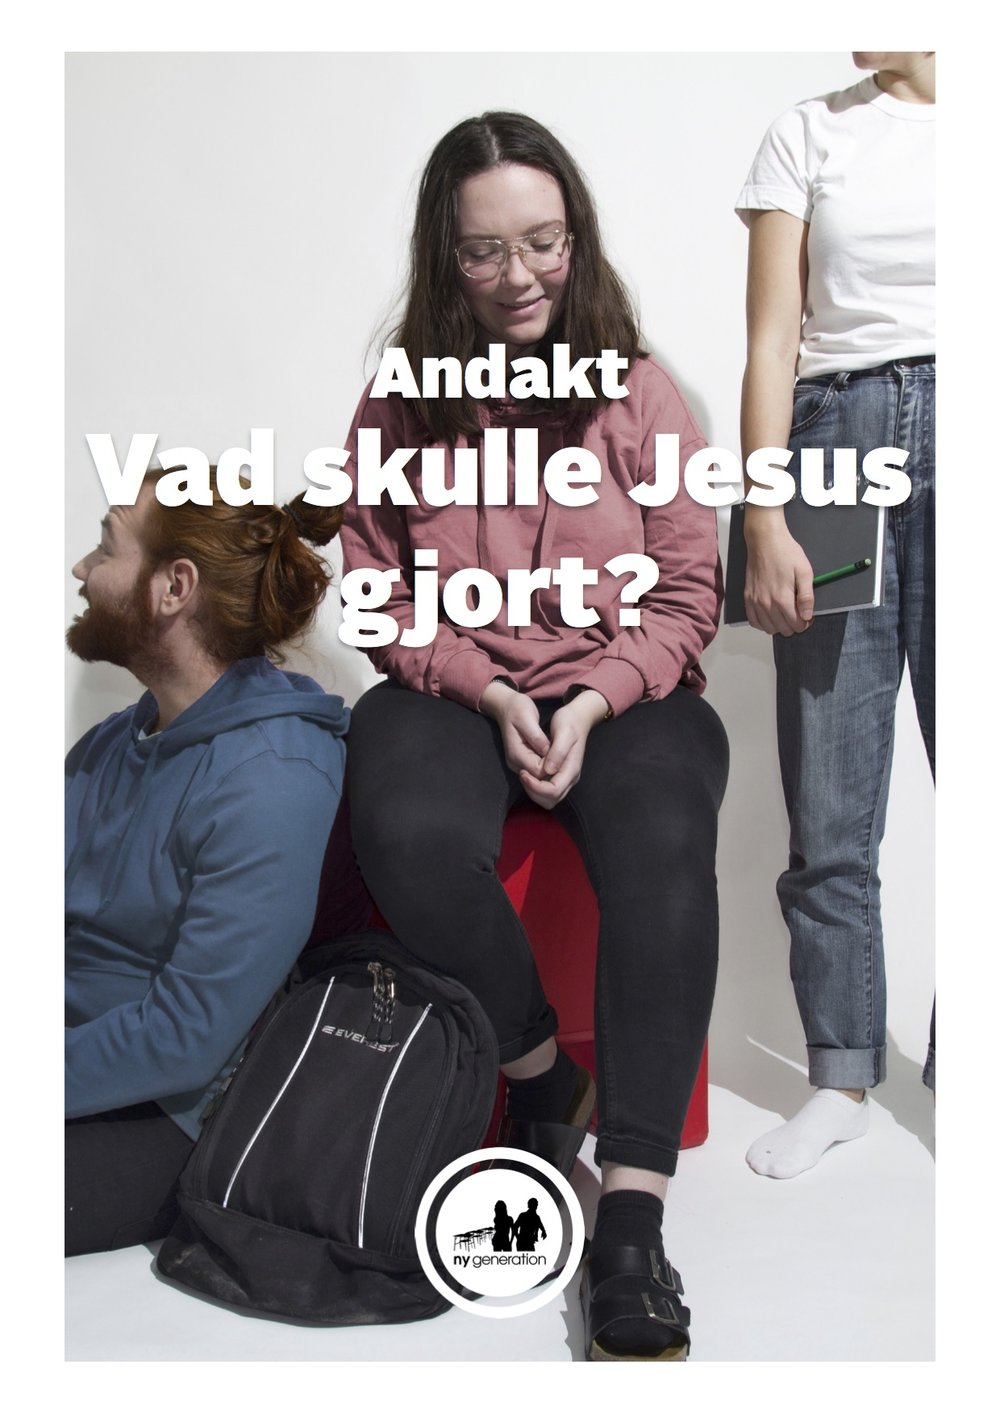 Andakt - Vad skulle Jesus gjort_.jpg